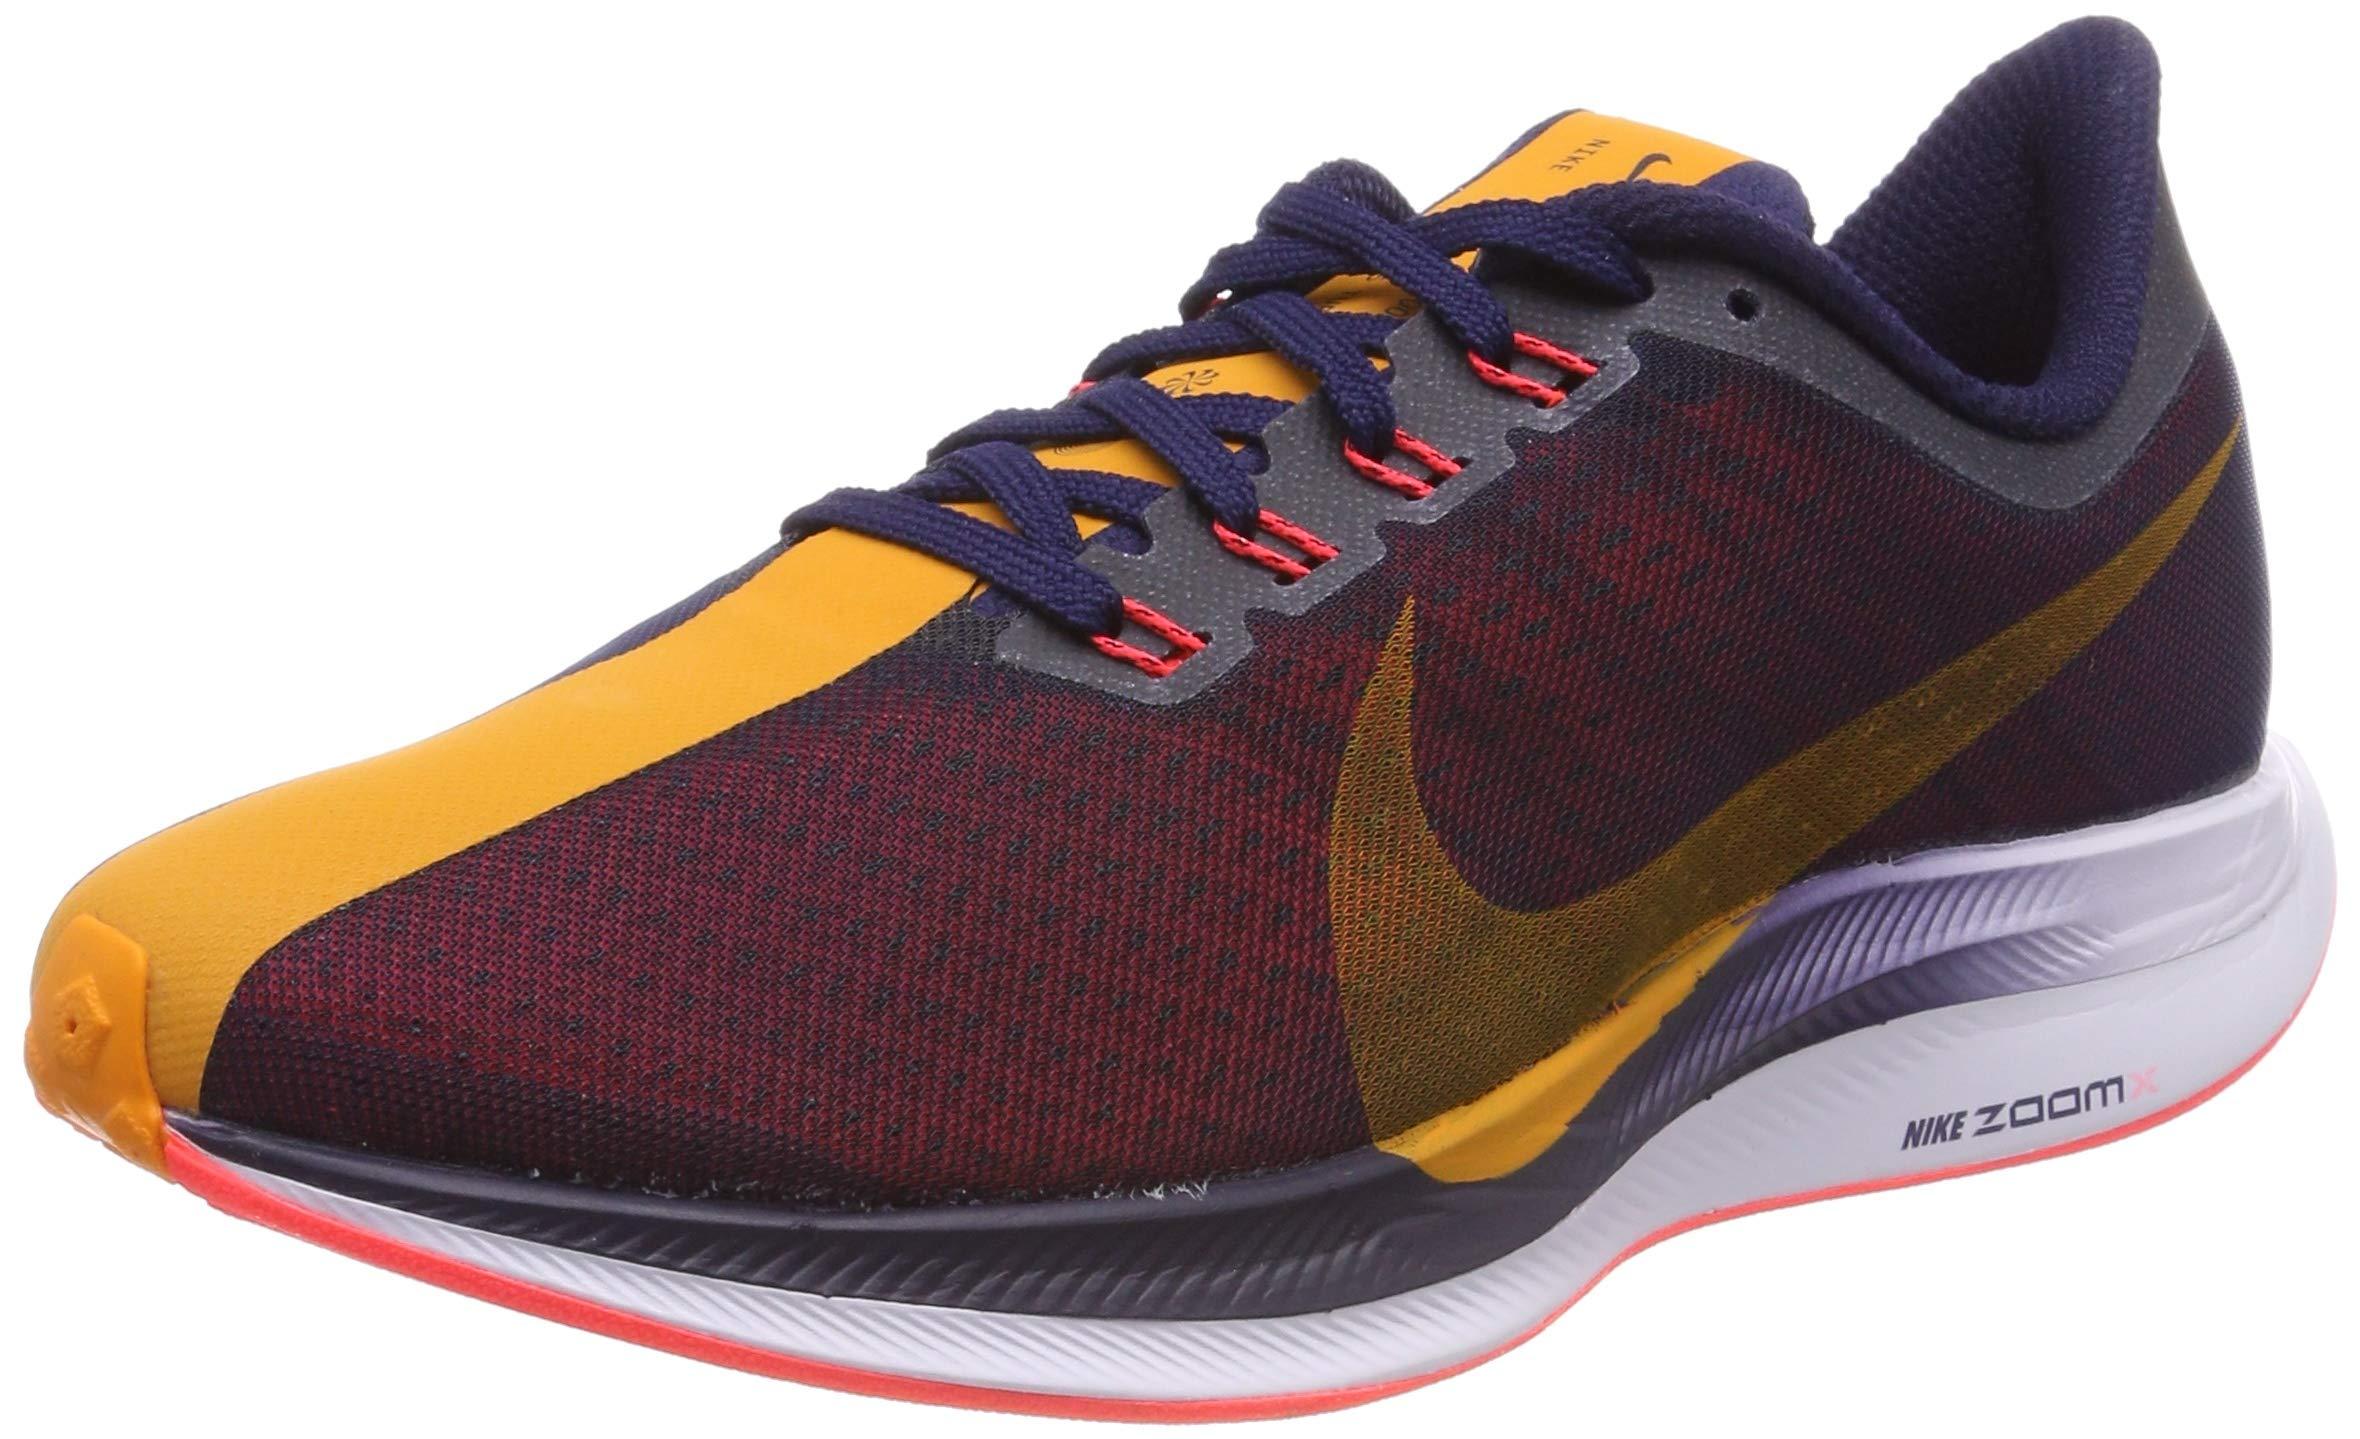 84e5ec29414a5 Galleon - Nike Men s Air Zoom Pegasus 35 Turbo Running Shoes (12 ...